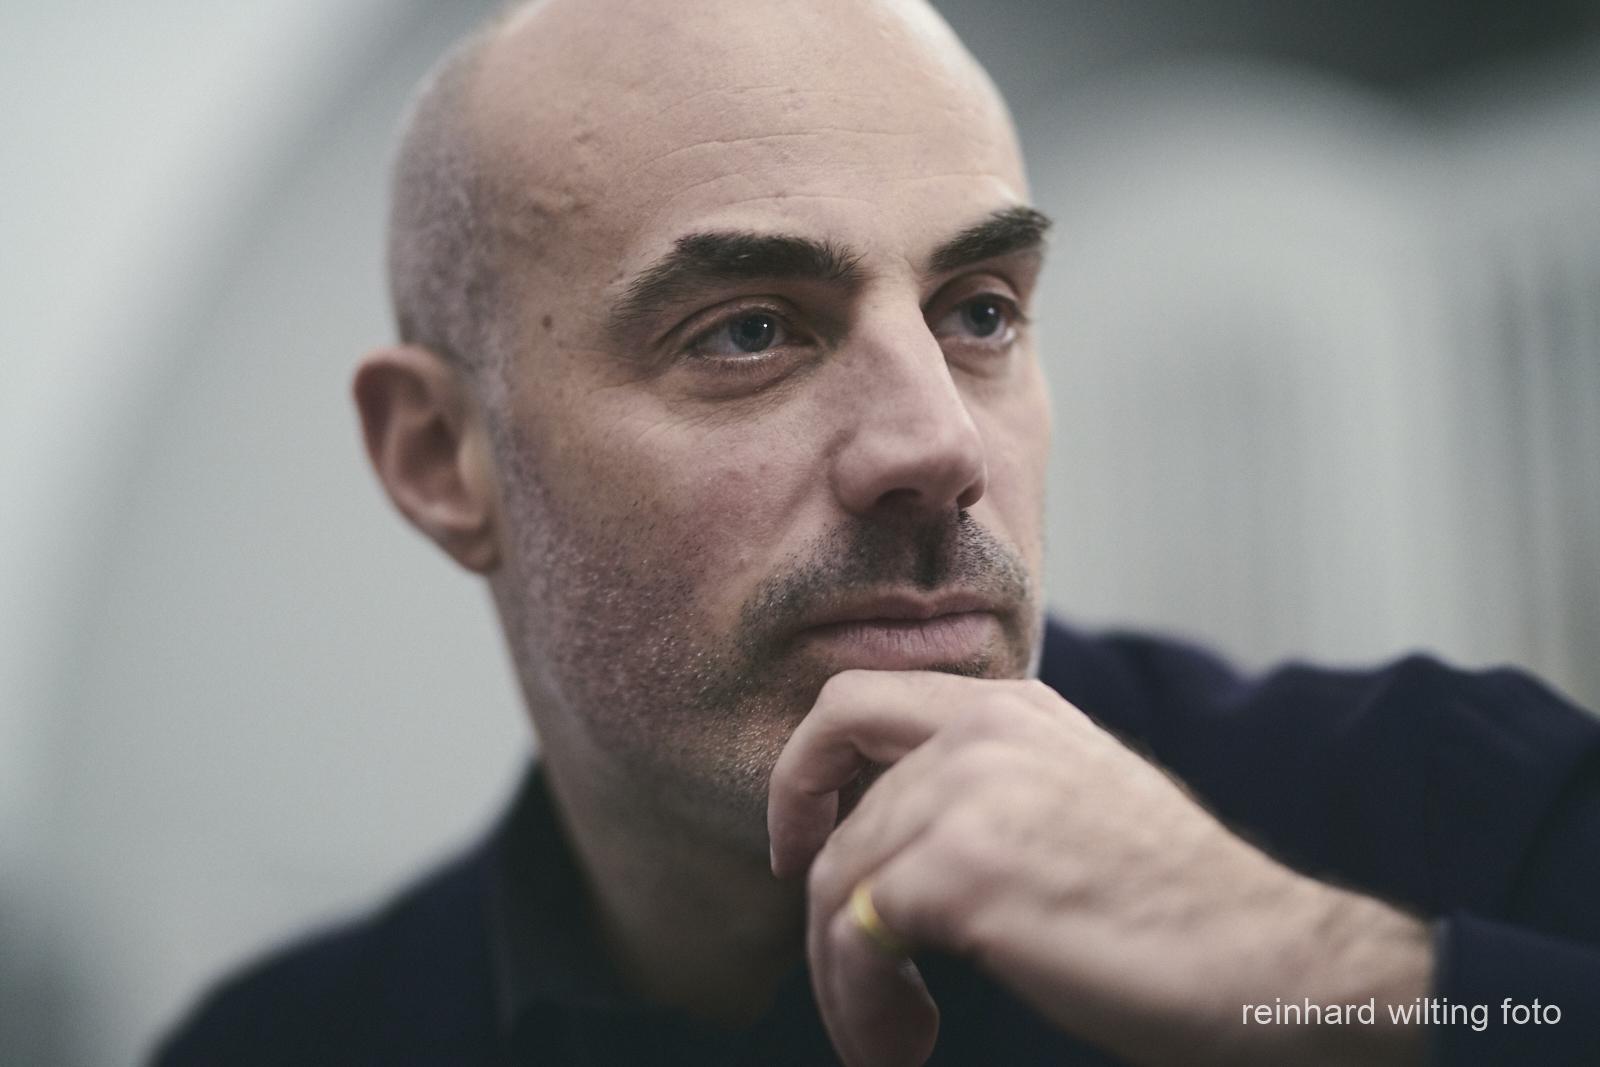 Jakob Bloch Jespersen, bass